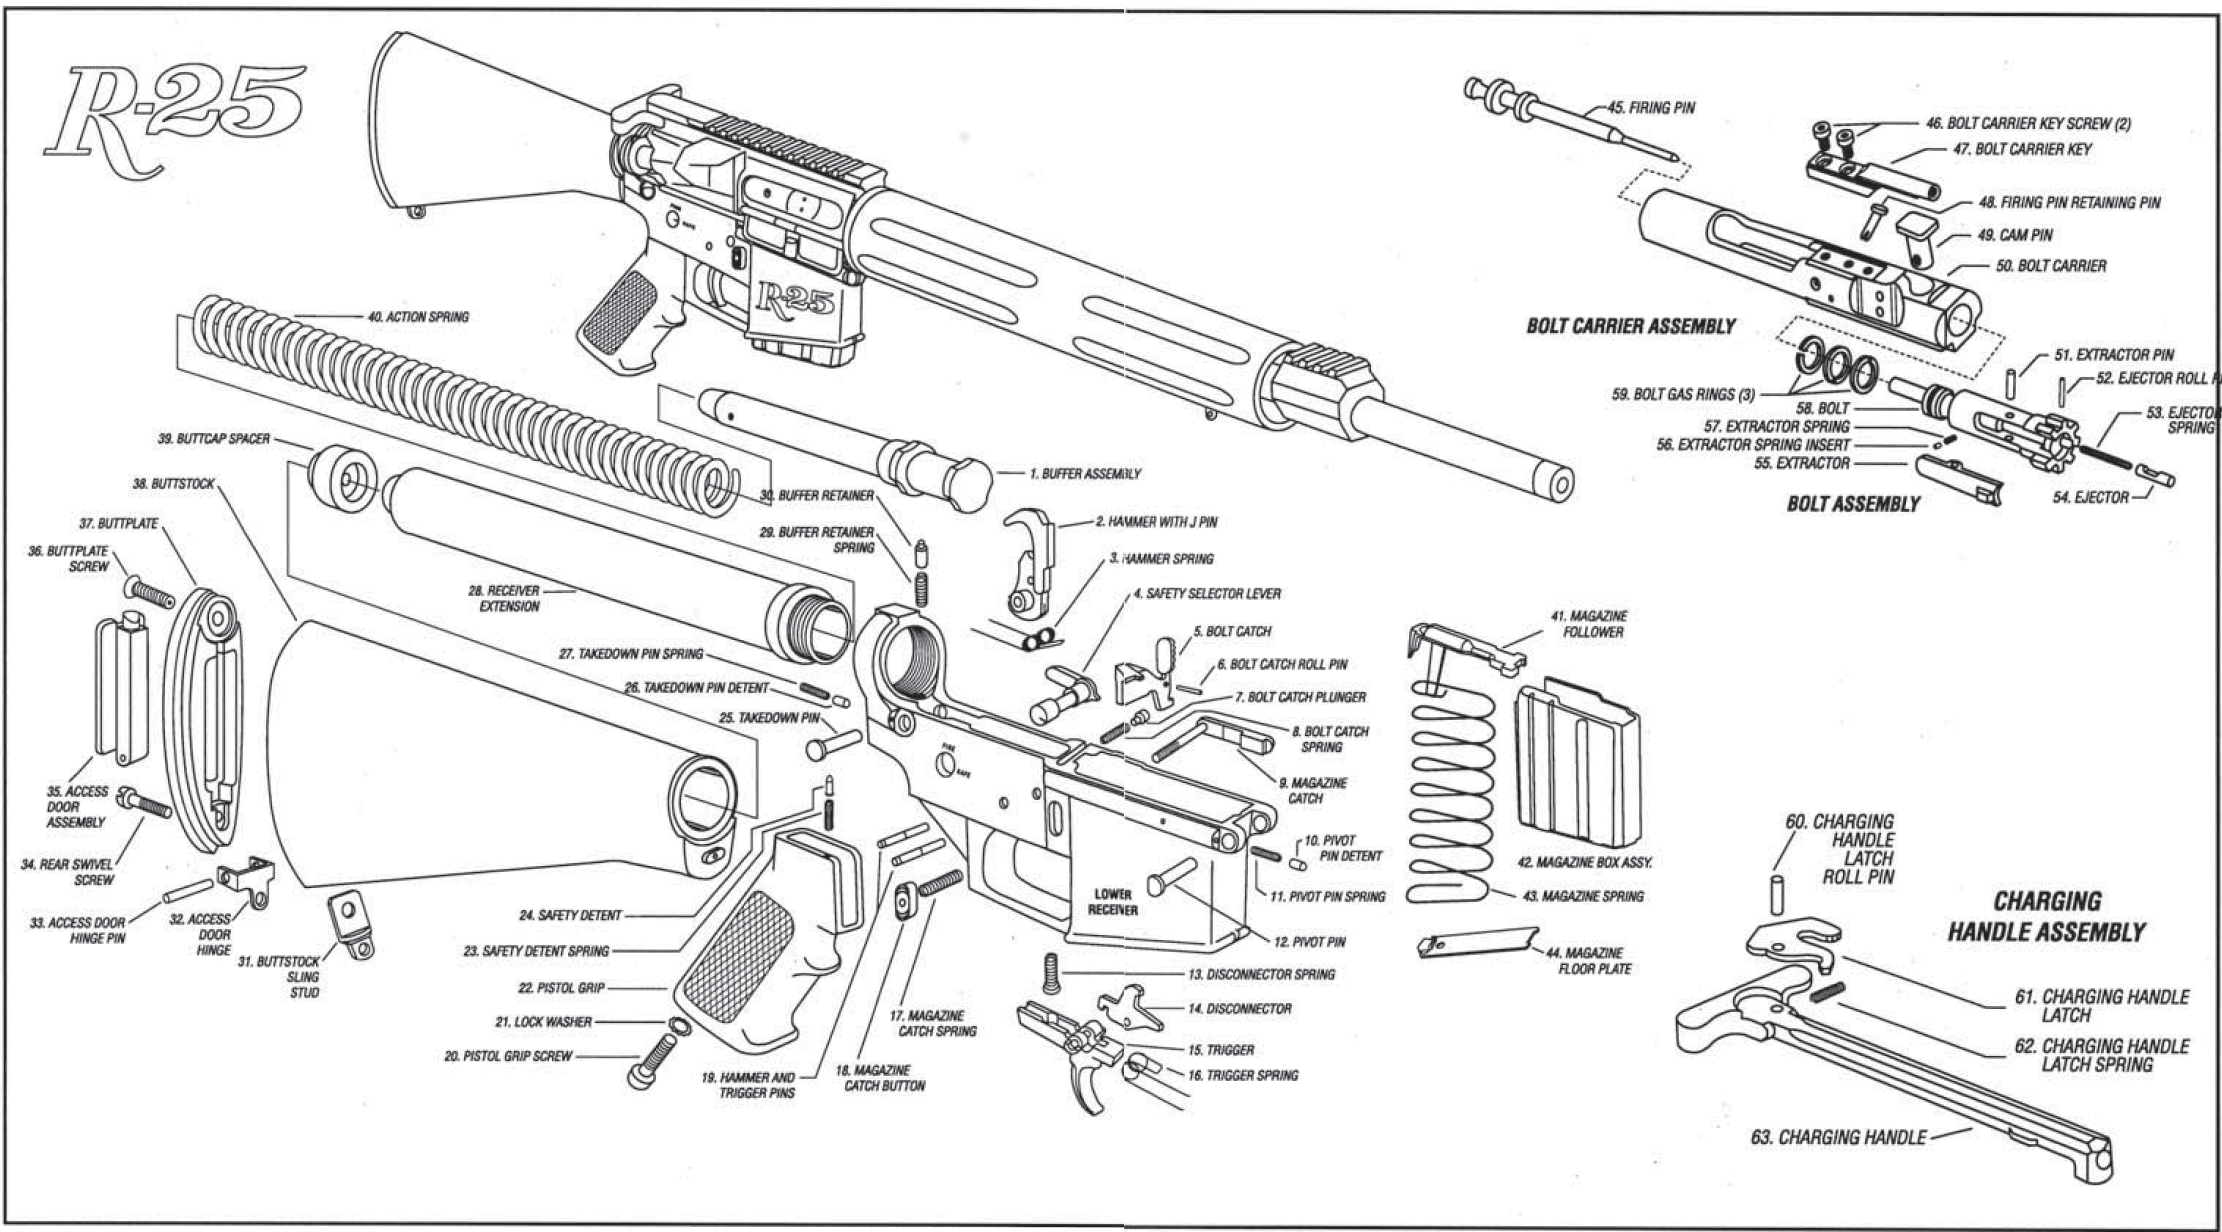 remington 1100 diagram pictures to pin on pinterest